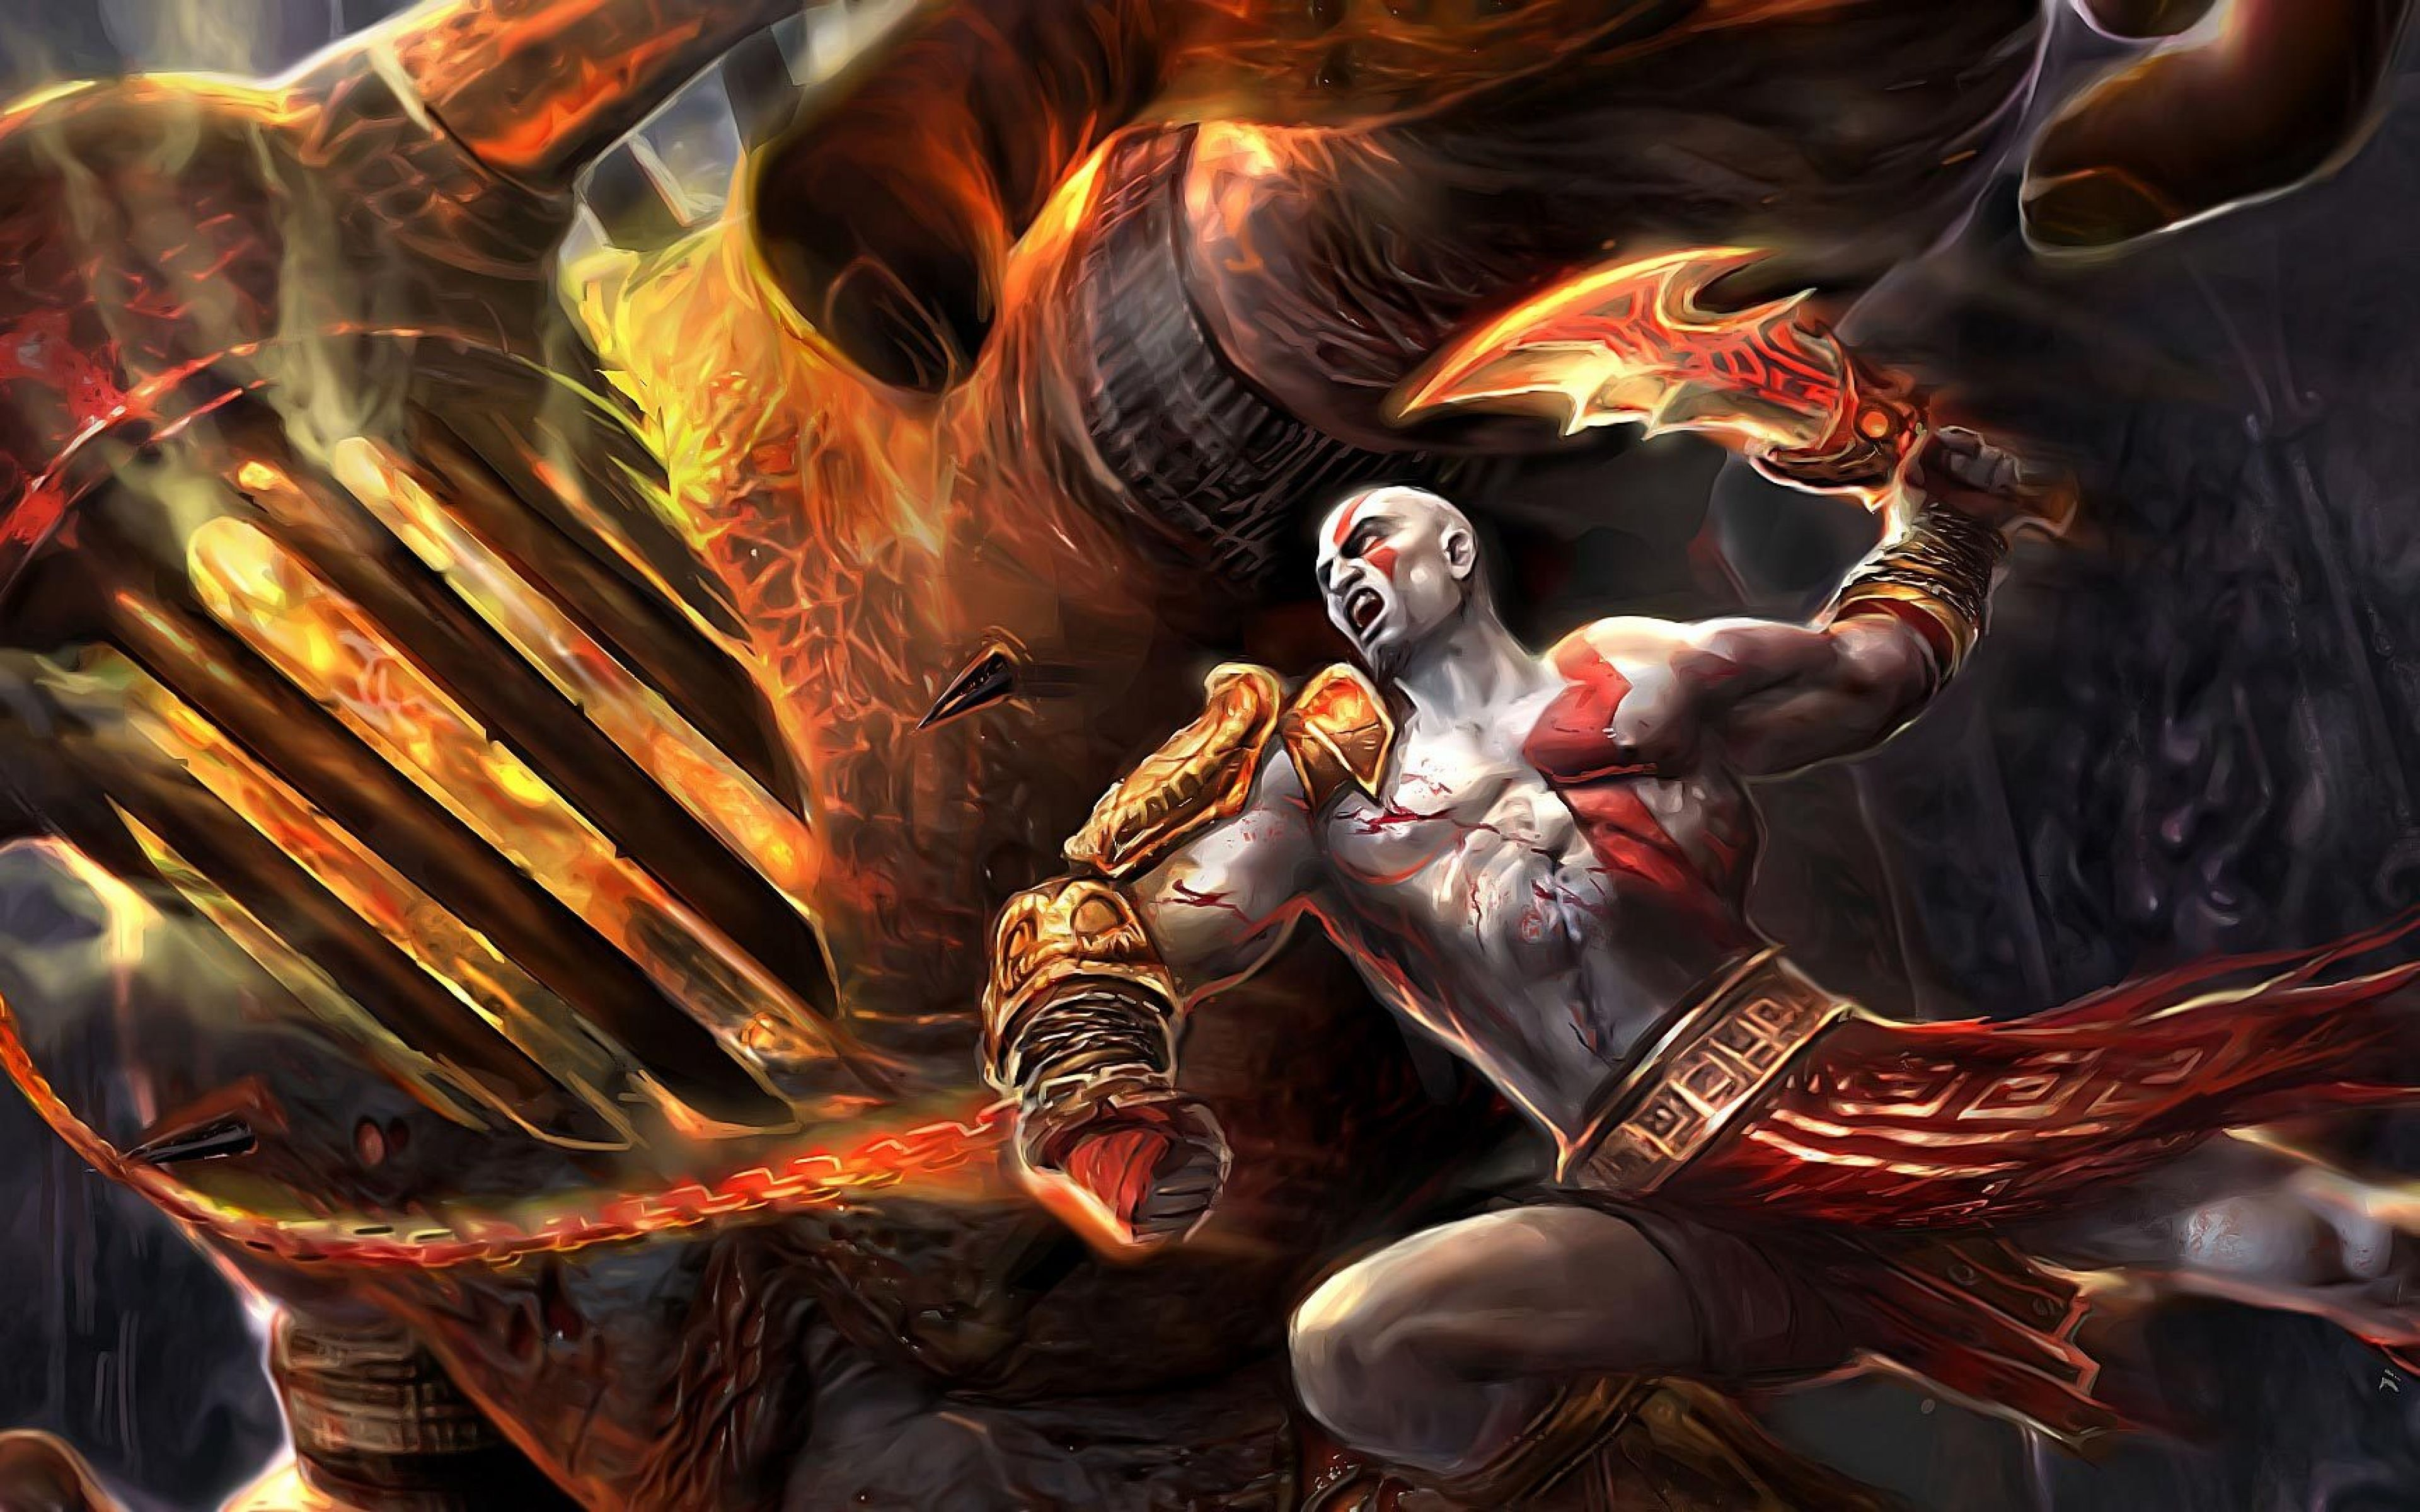 God Of War 3 Kratos Wallpaper Full Hd Tqk Kratos God Of War